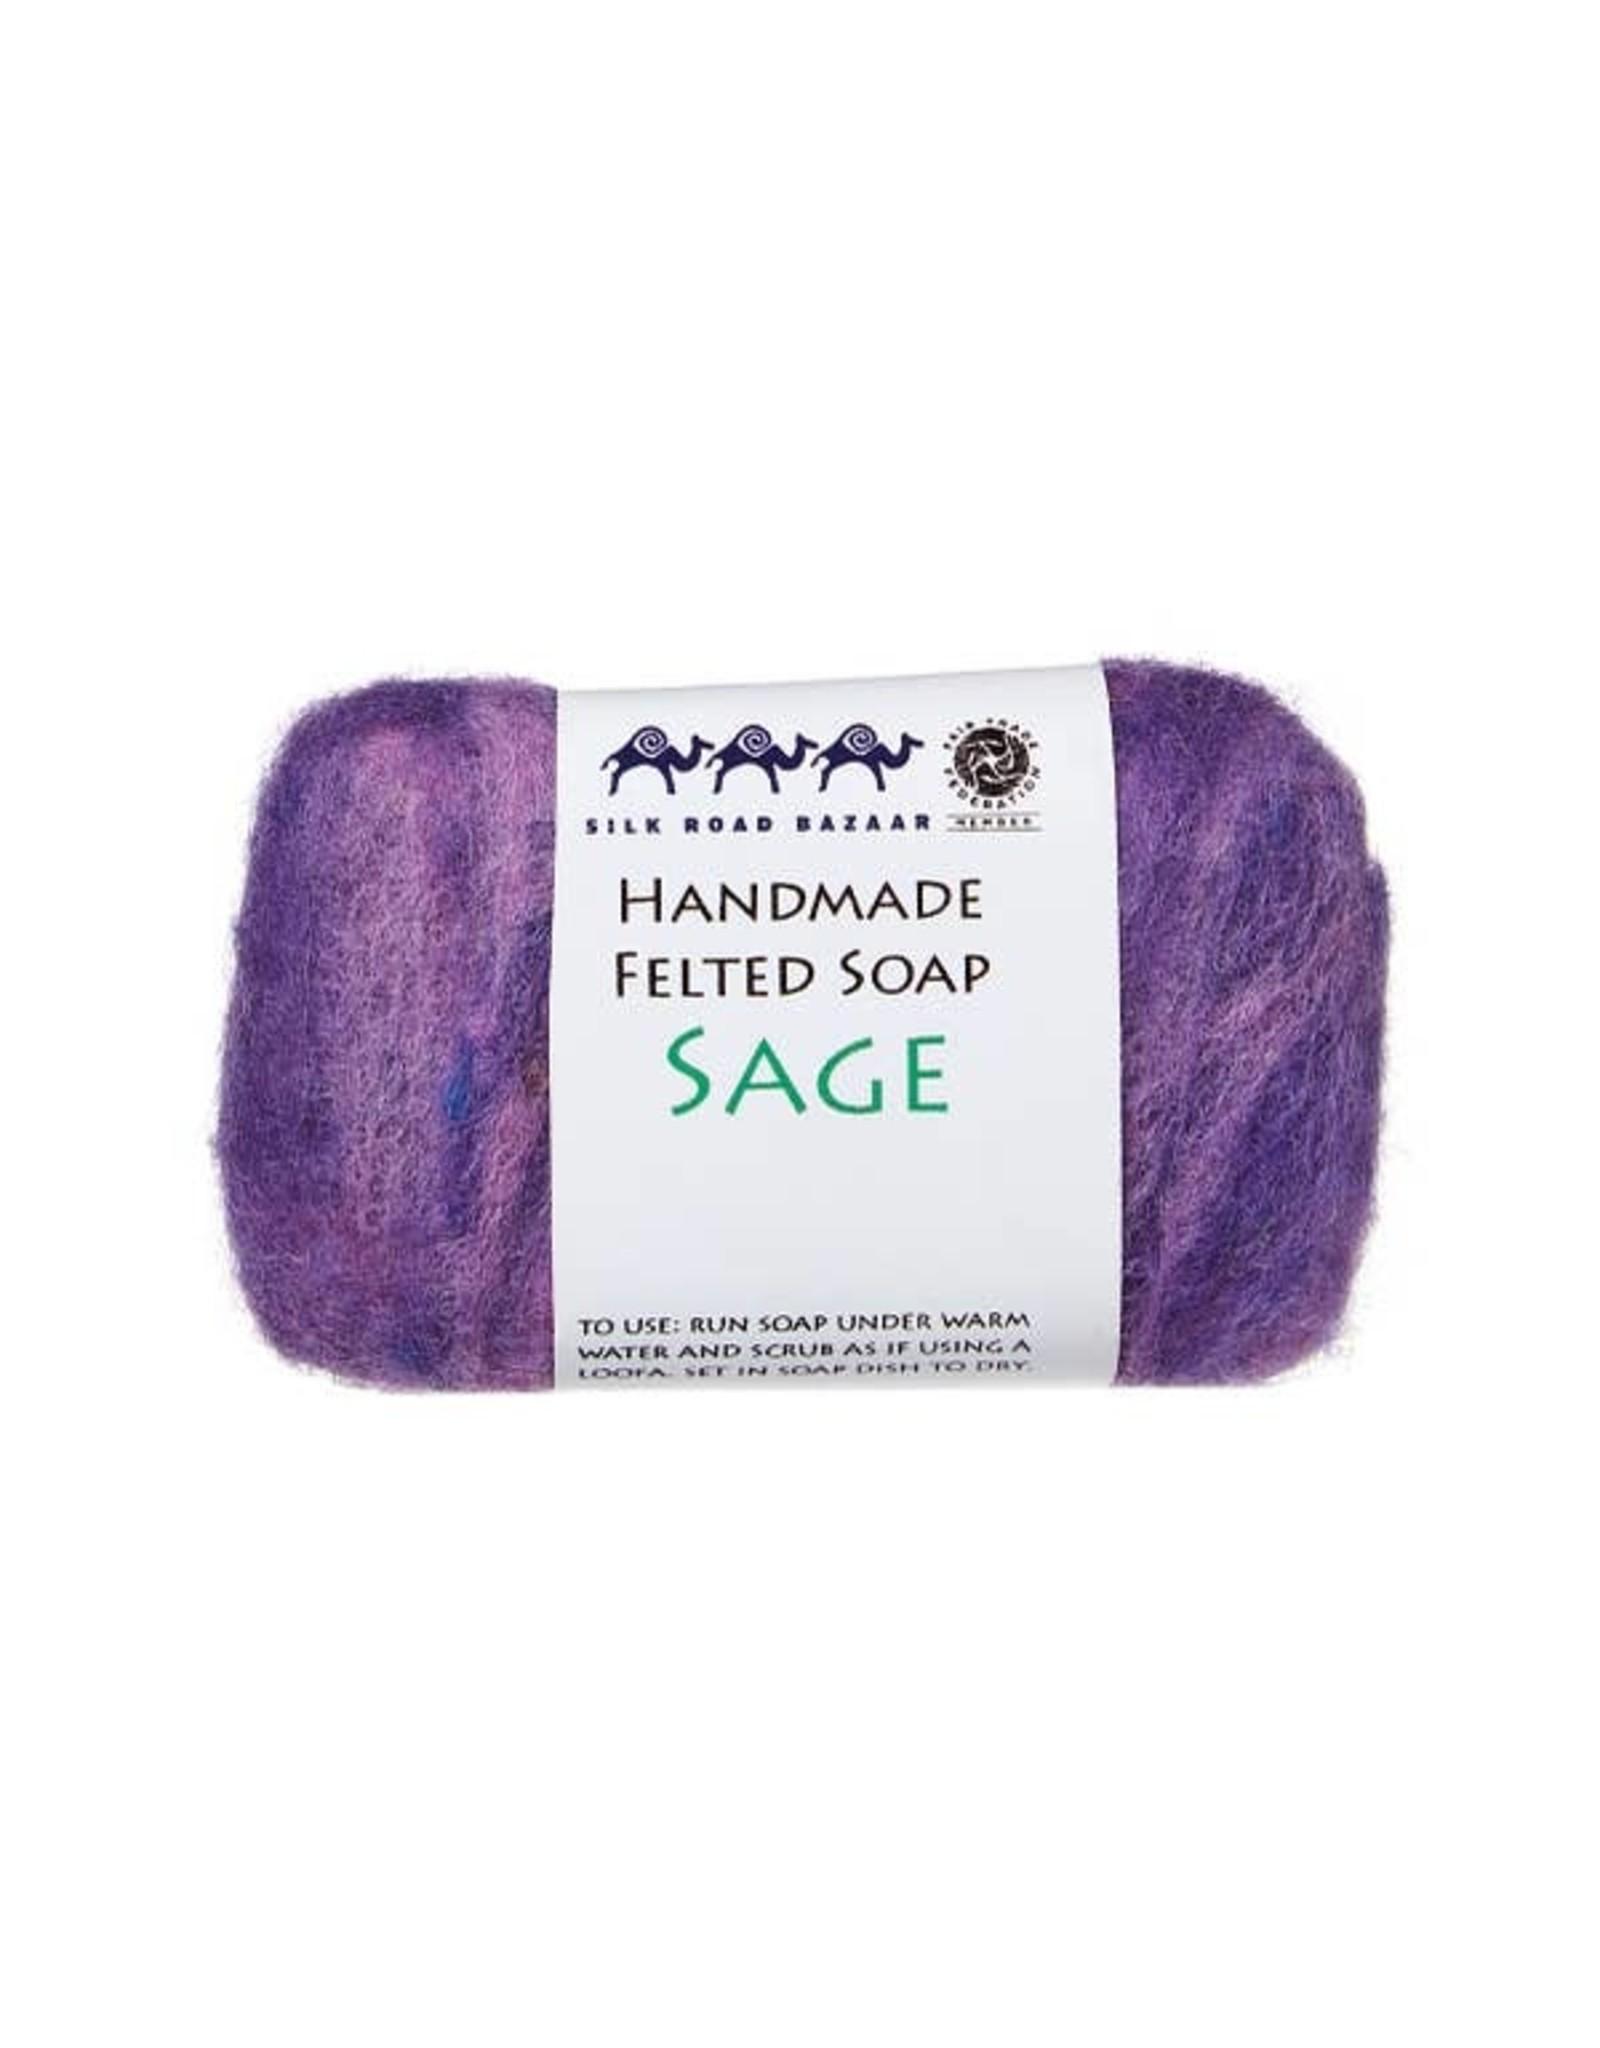 Silk Road Bazaar Sage Handmade Felted Soap